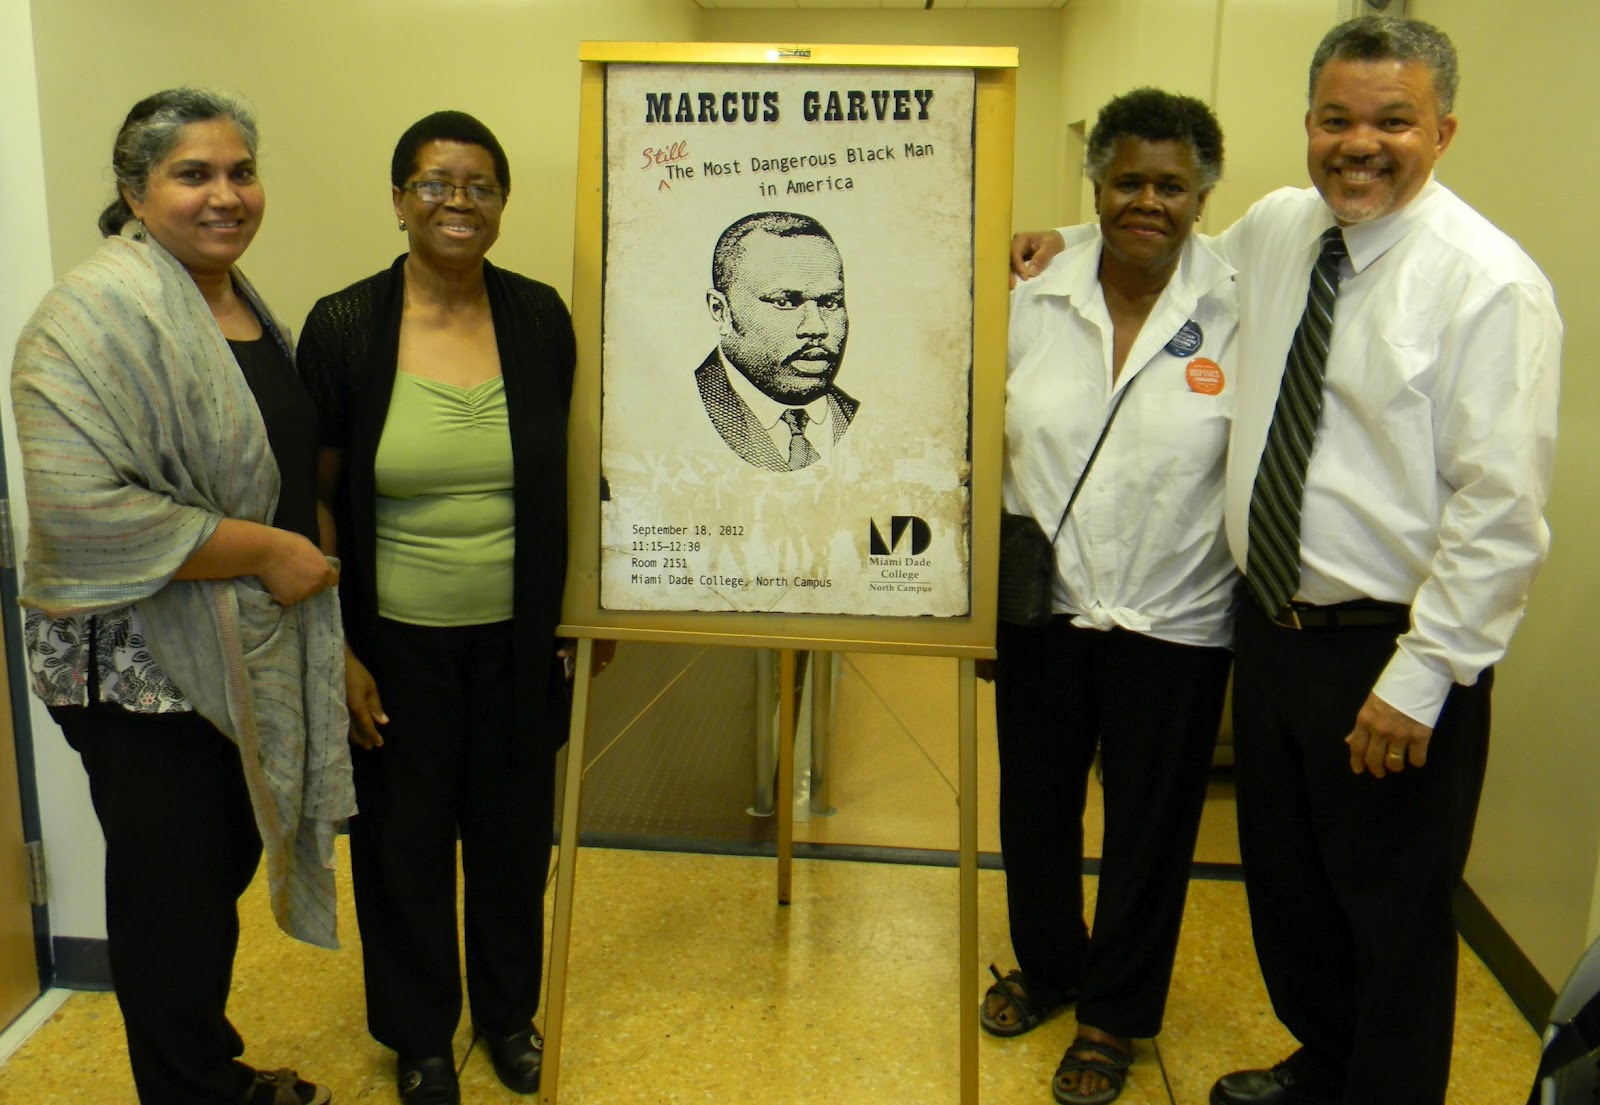 children s publishing blog geoffrey philp s blog marcus garvey still the most dangerous black man in america